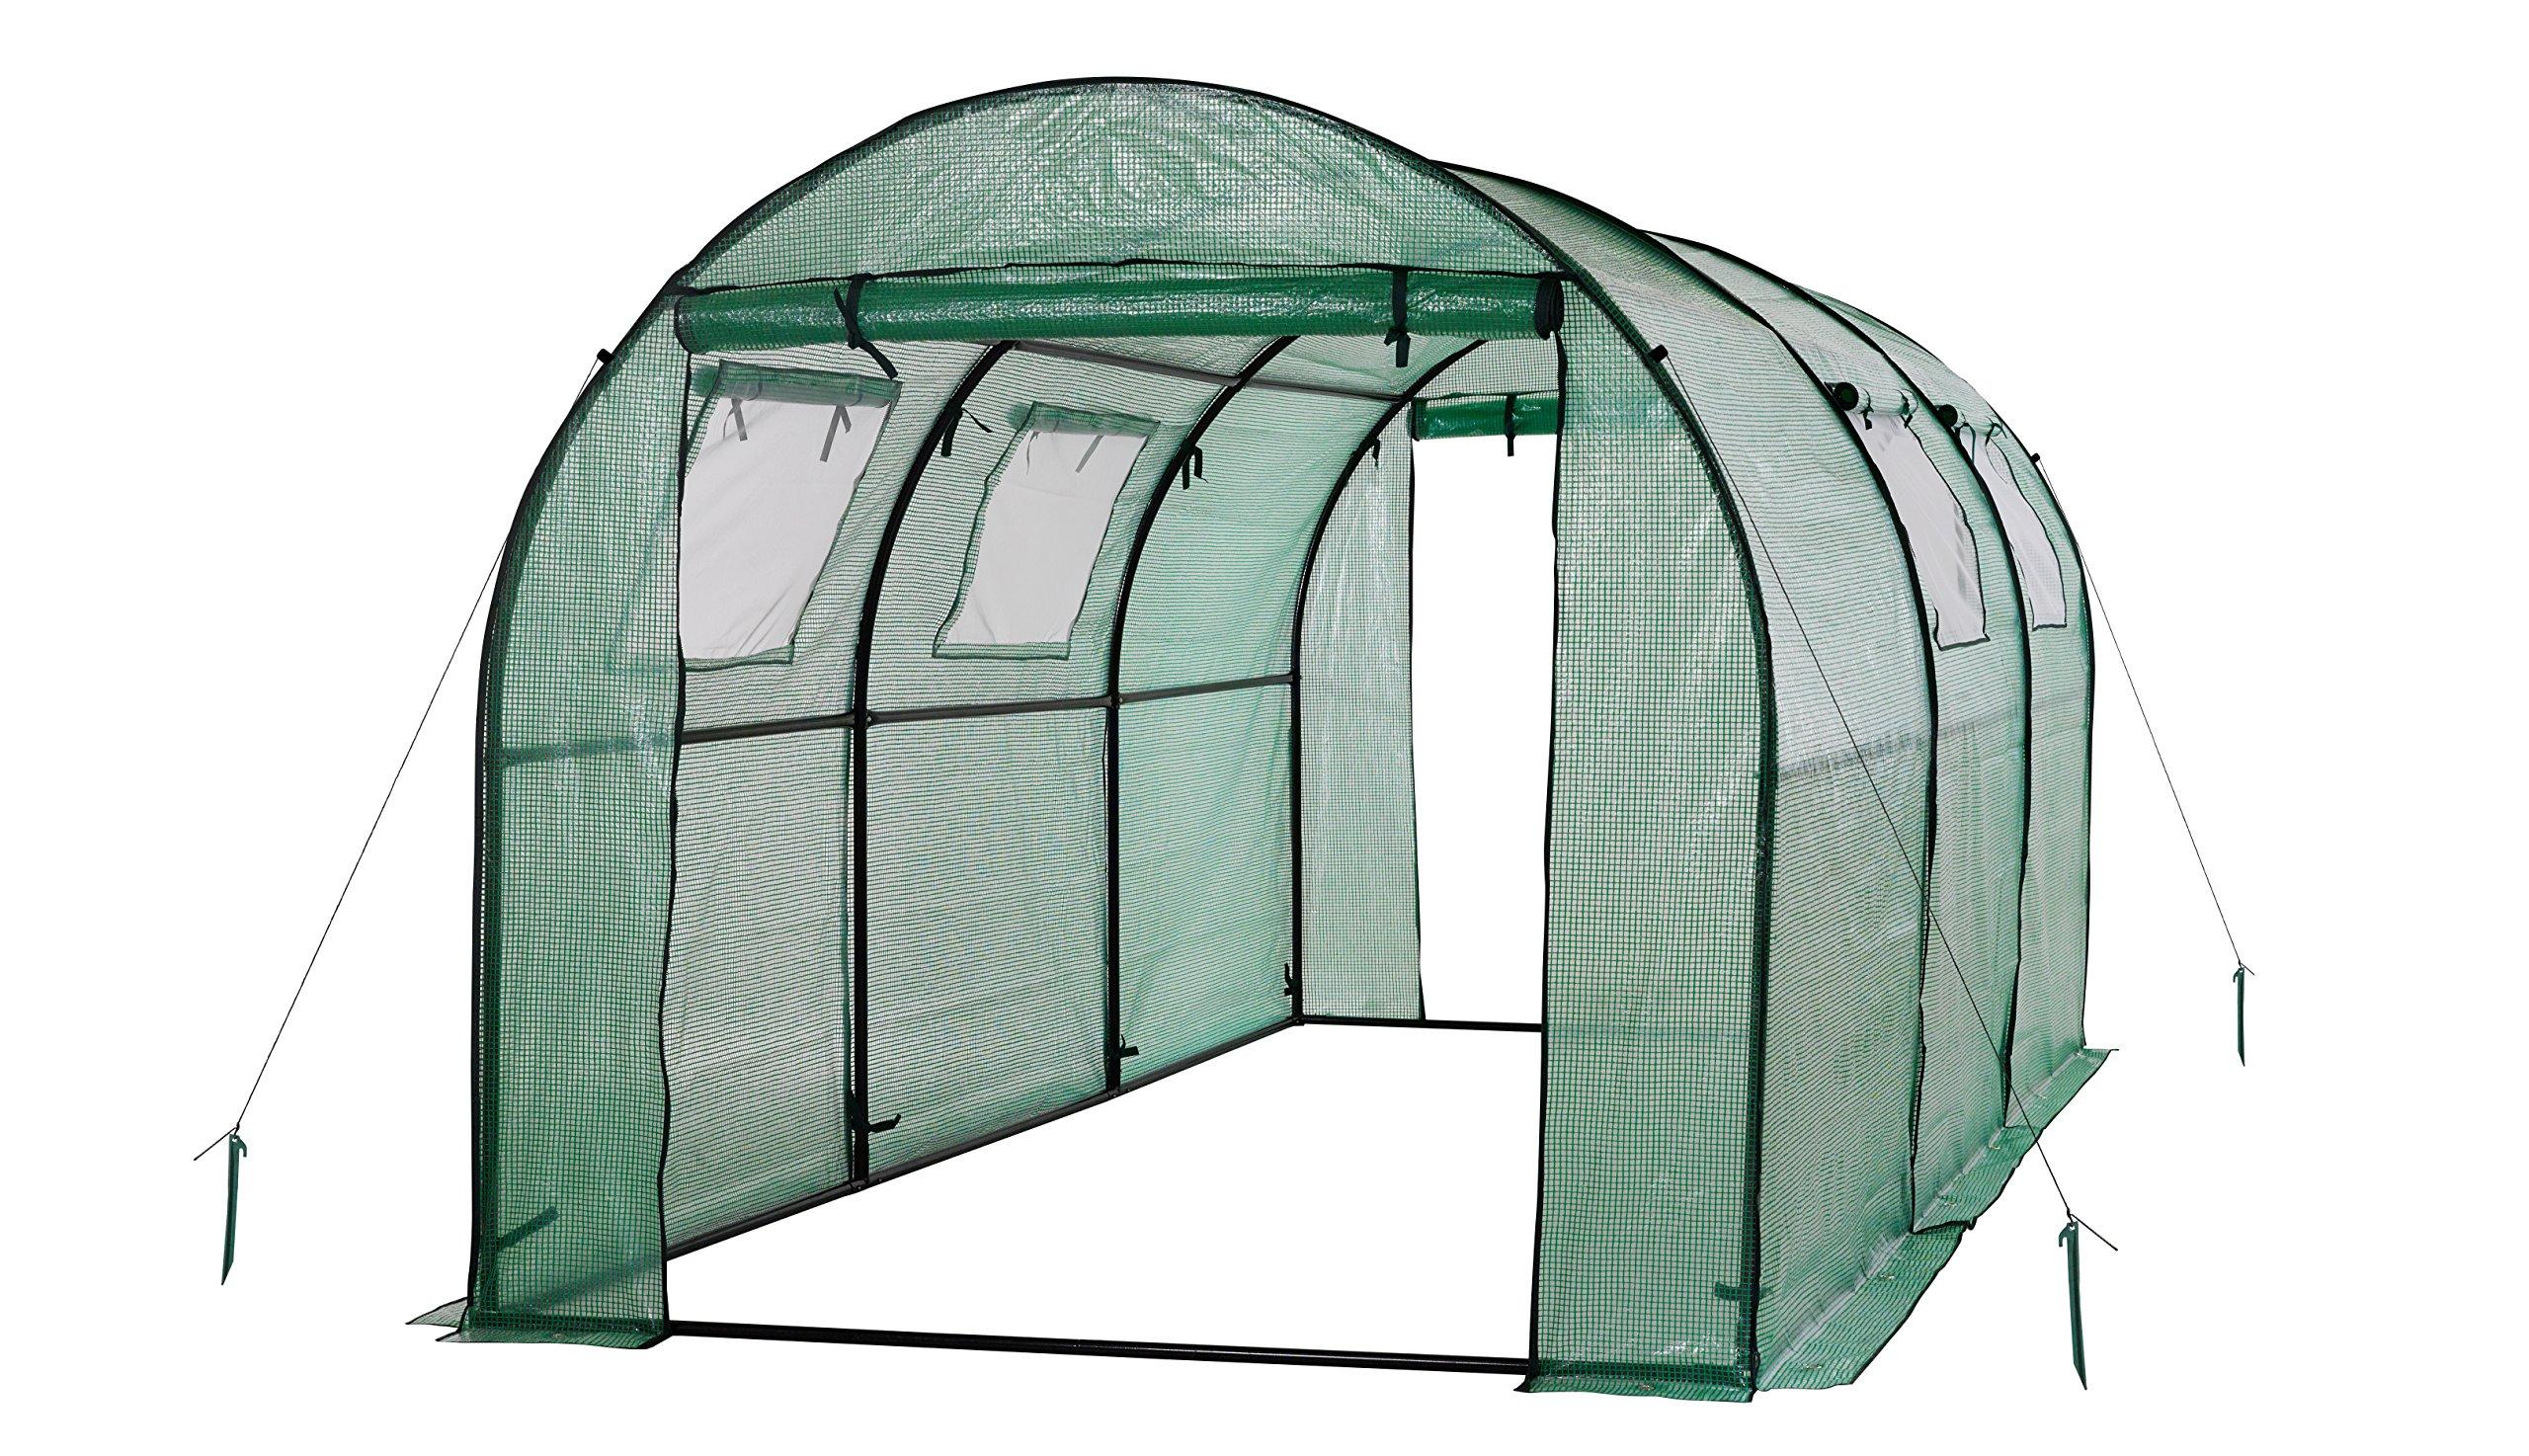 Ogrow 2 Door Walk-In Tunnel Greenhouse With Ventilation Windows & Steel Frame, 15' x 6' x 6', Green by OGrow